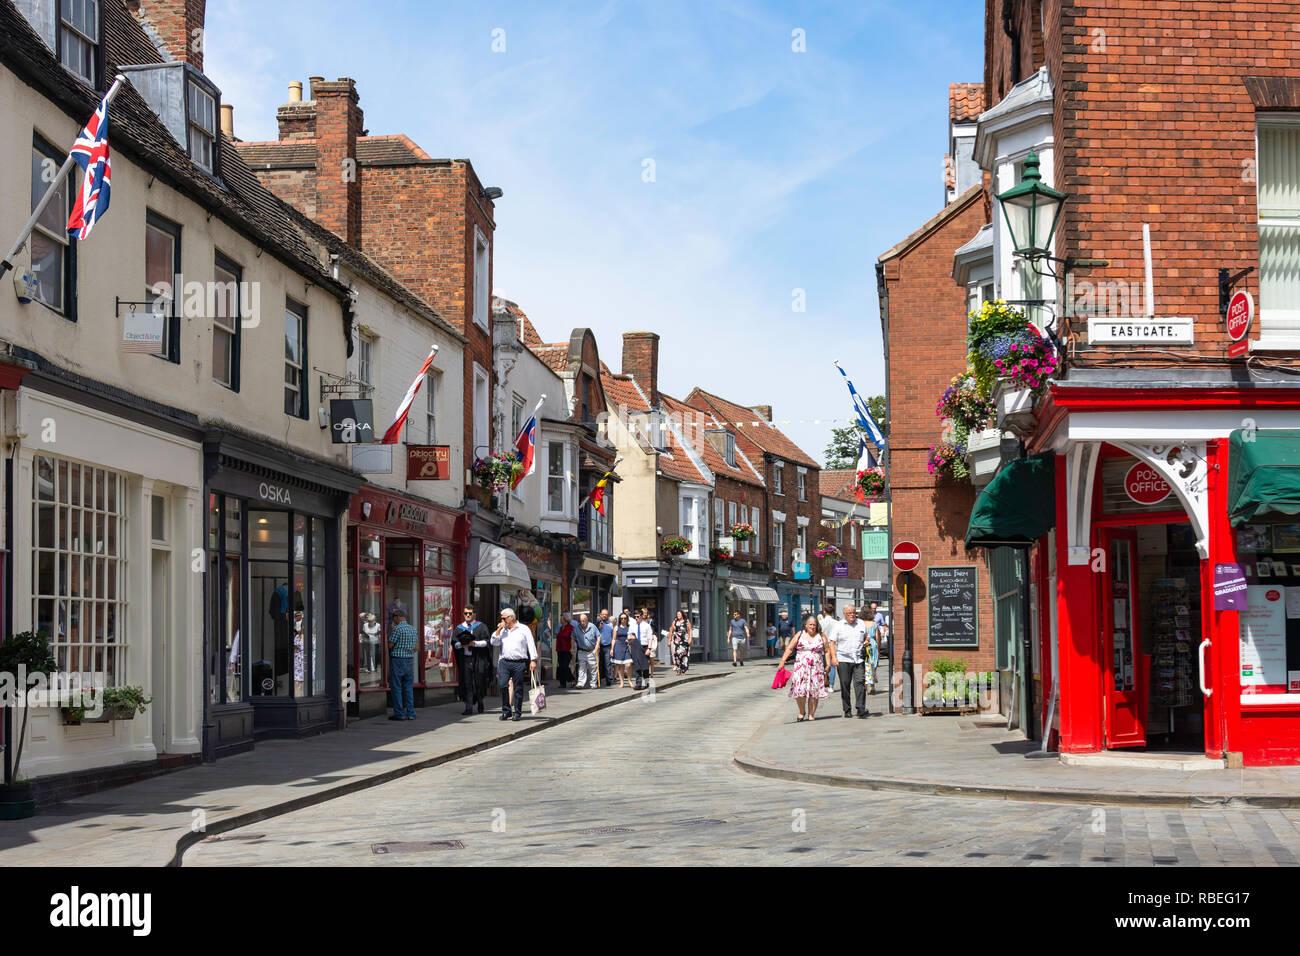 Bailgate, Lincoln, Lincolnshire, England, United Kingdom - Stock Image